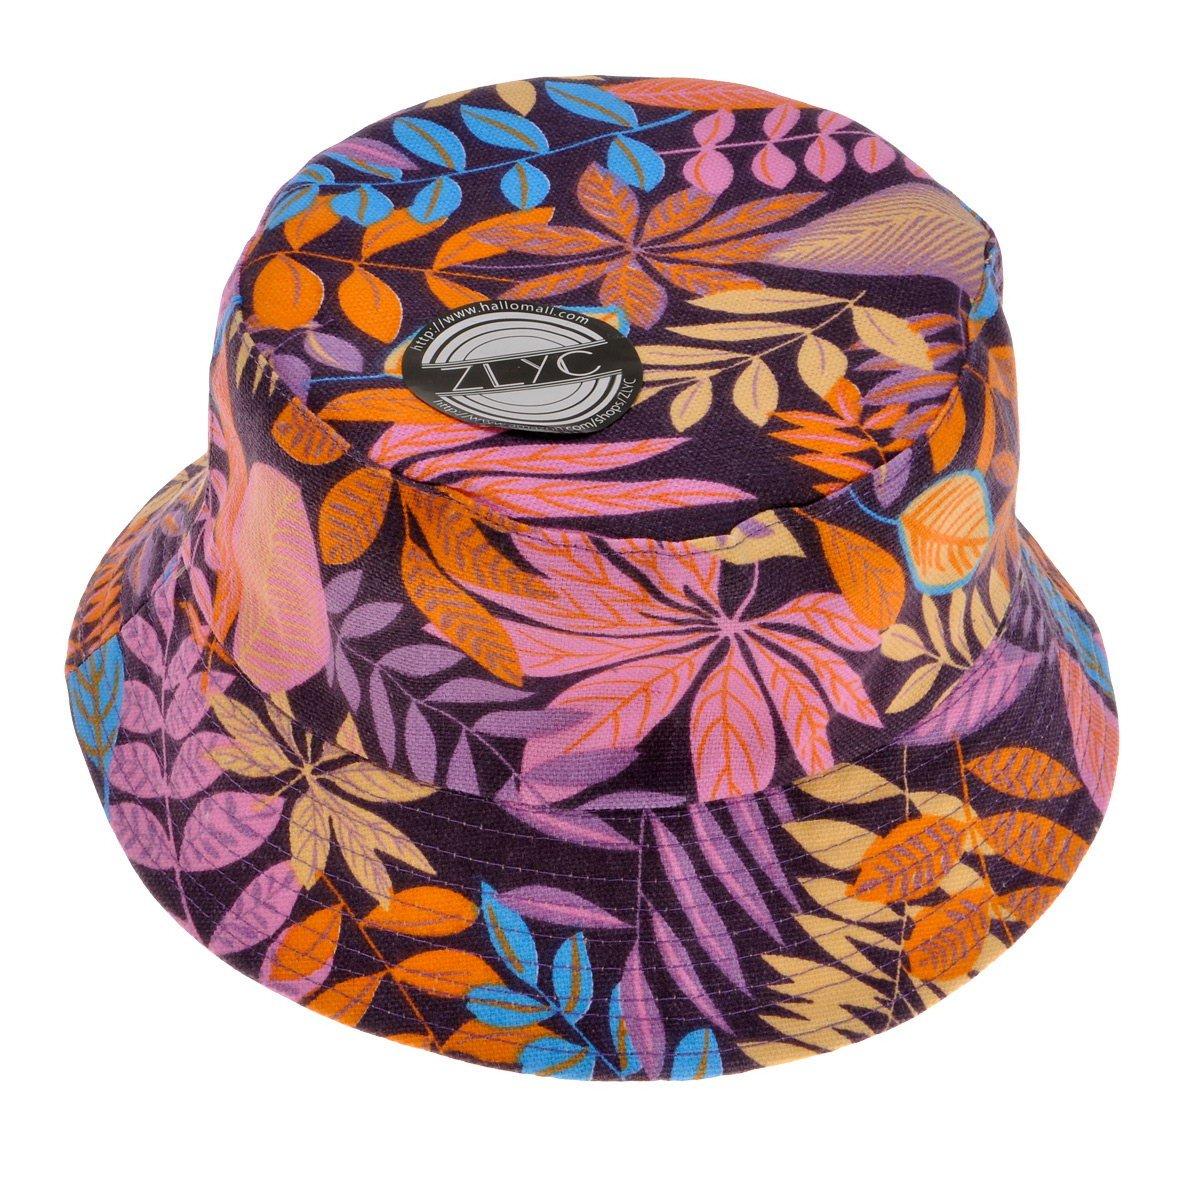 ZLYC Fashion Bucket Hat Summer Fisherman Cap for Women Men Teens ZYJ-MZ-092-RD